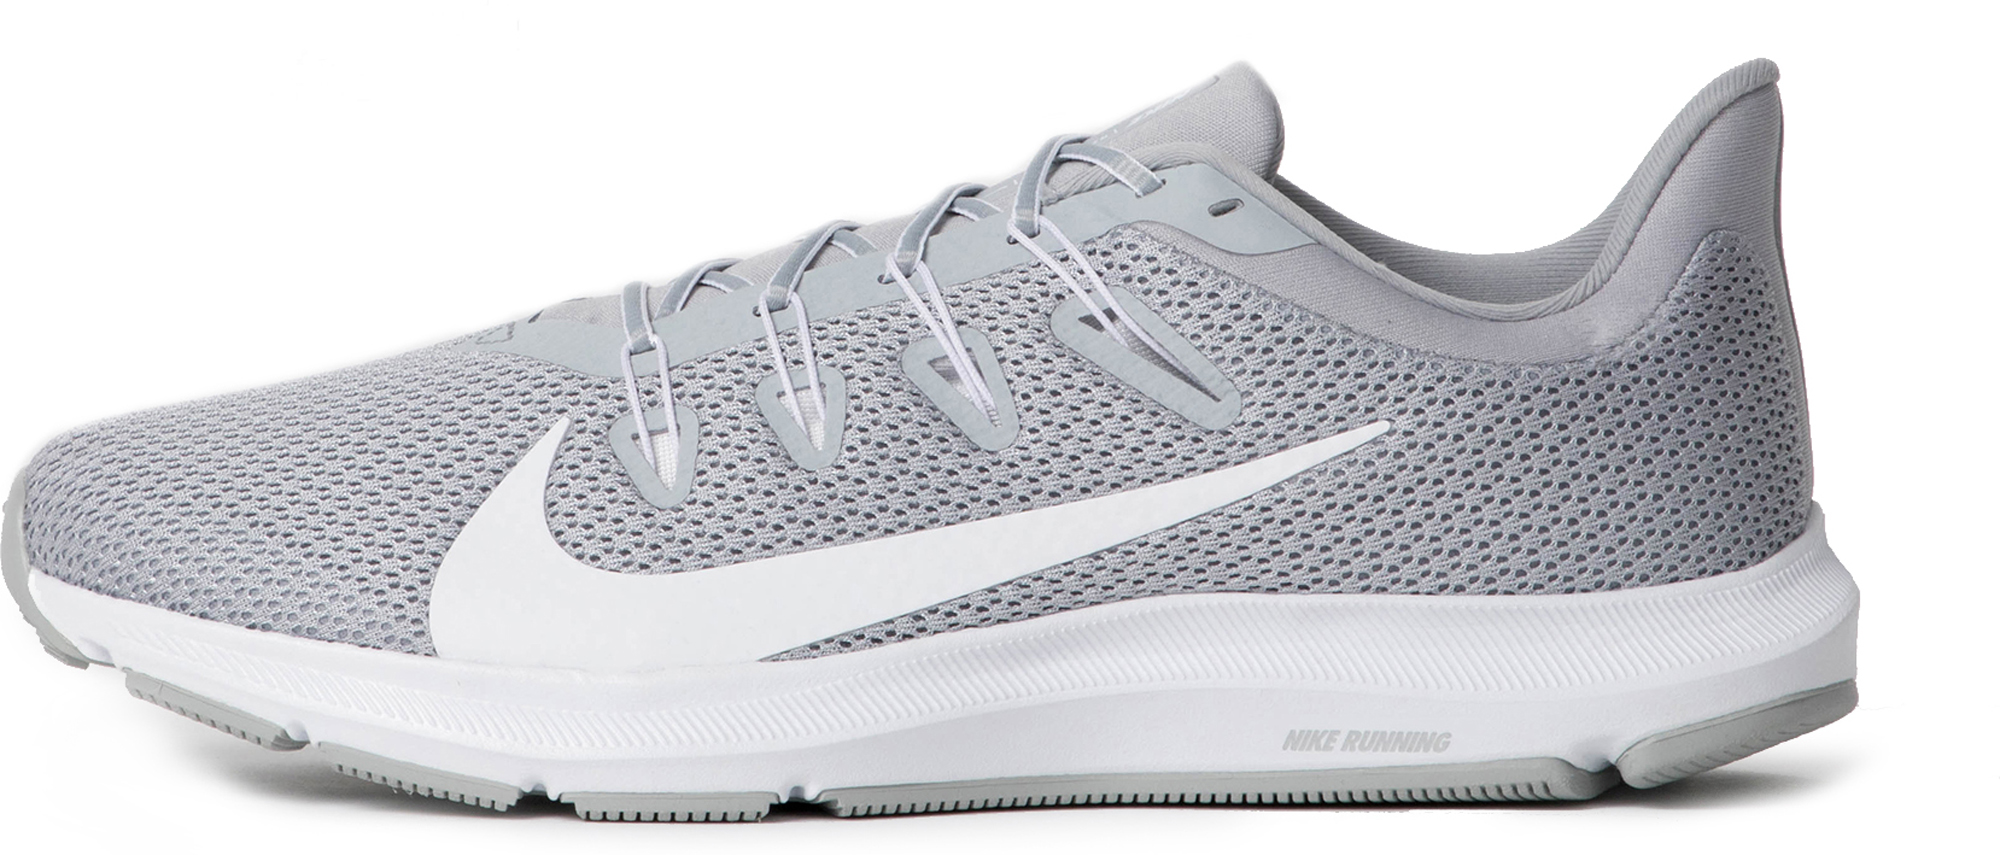 Nike Кроссовки мужские Nike Quest 2, размер 42